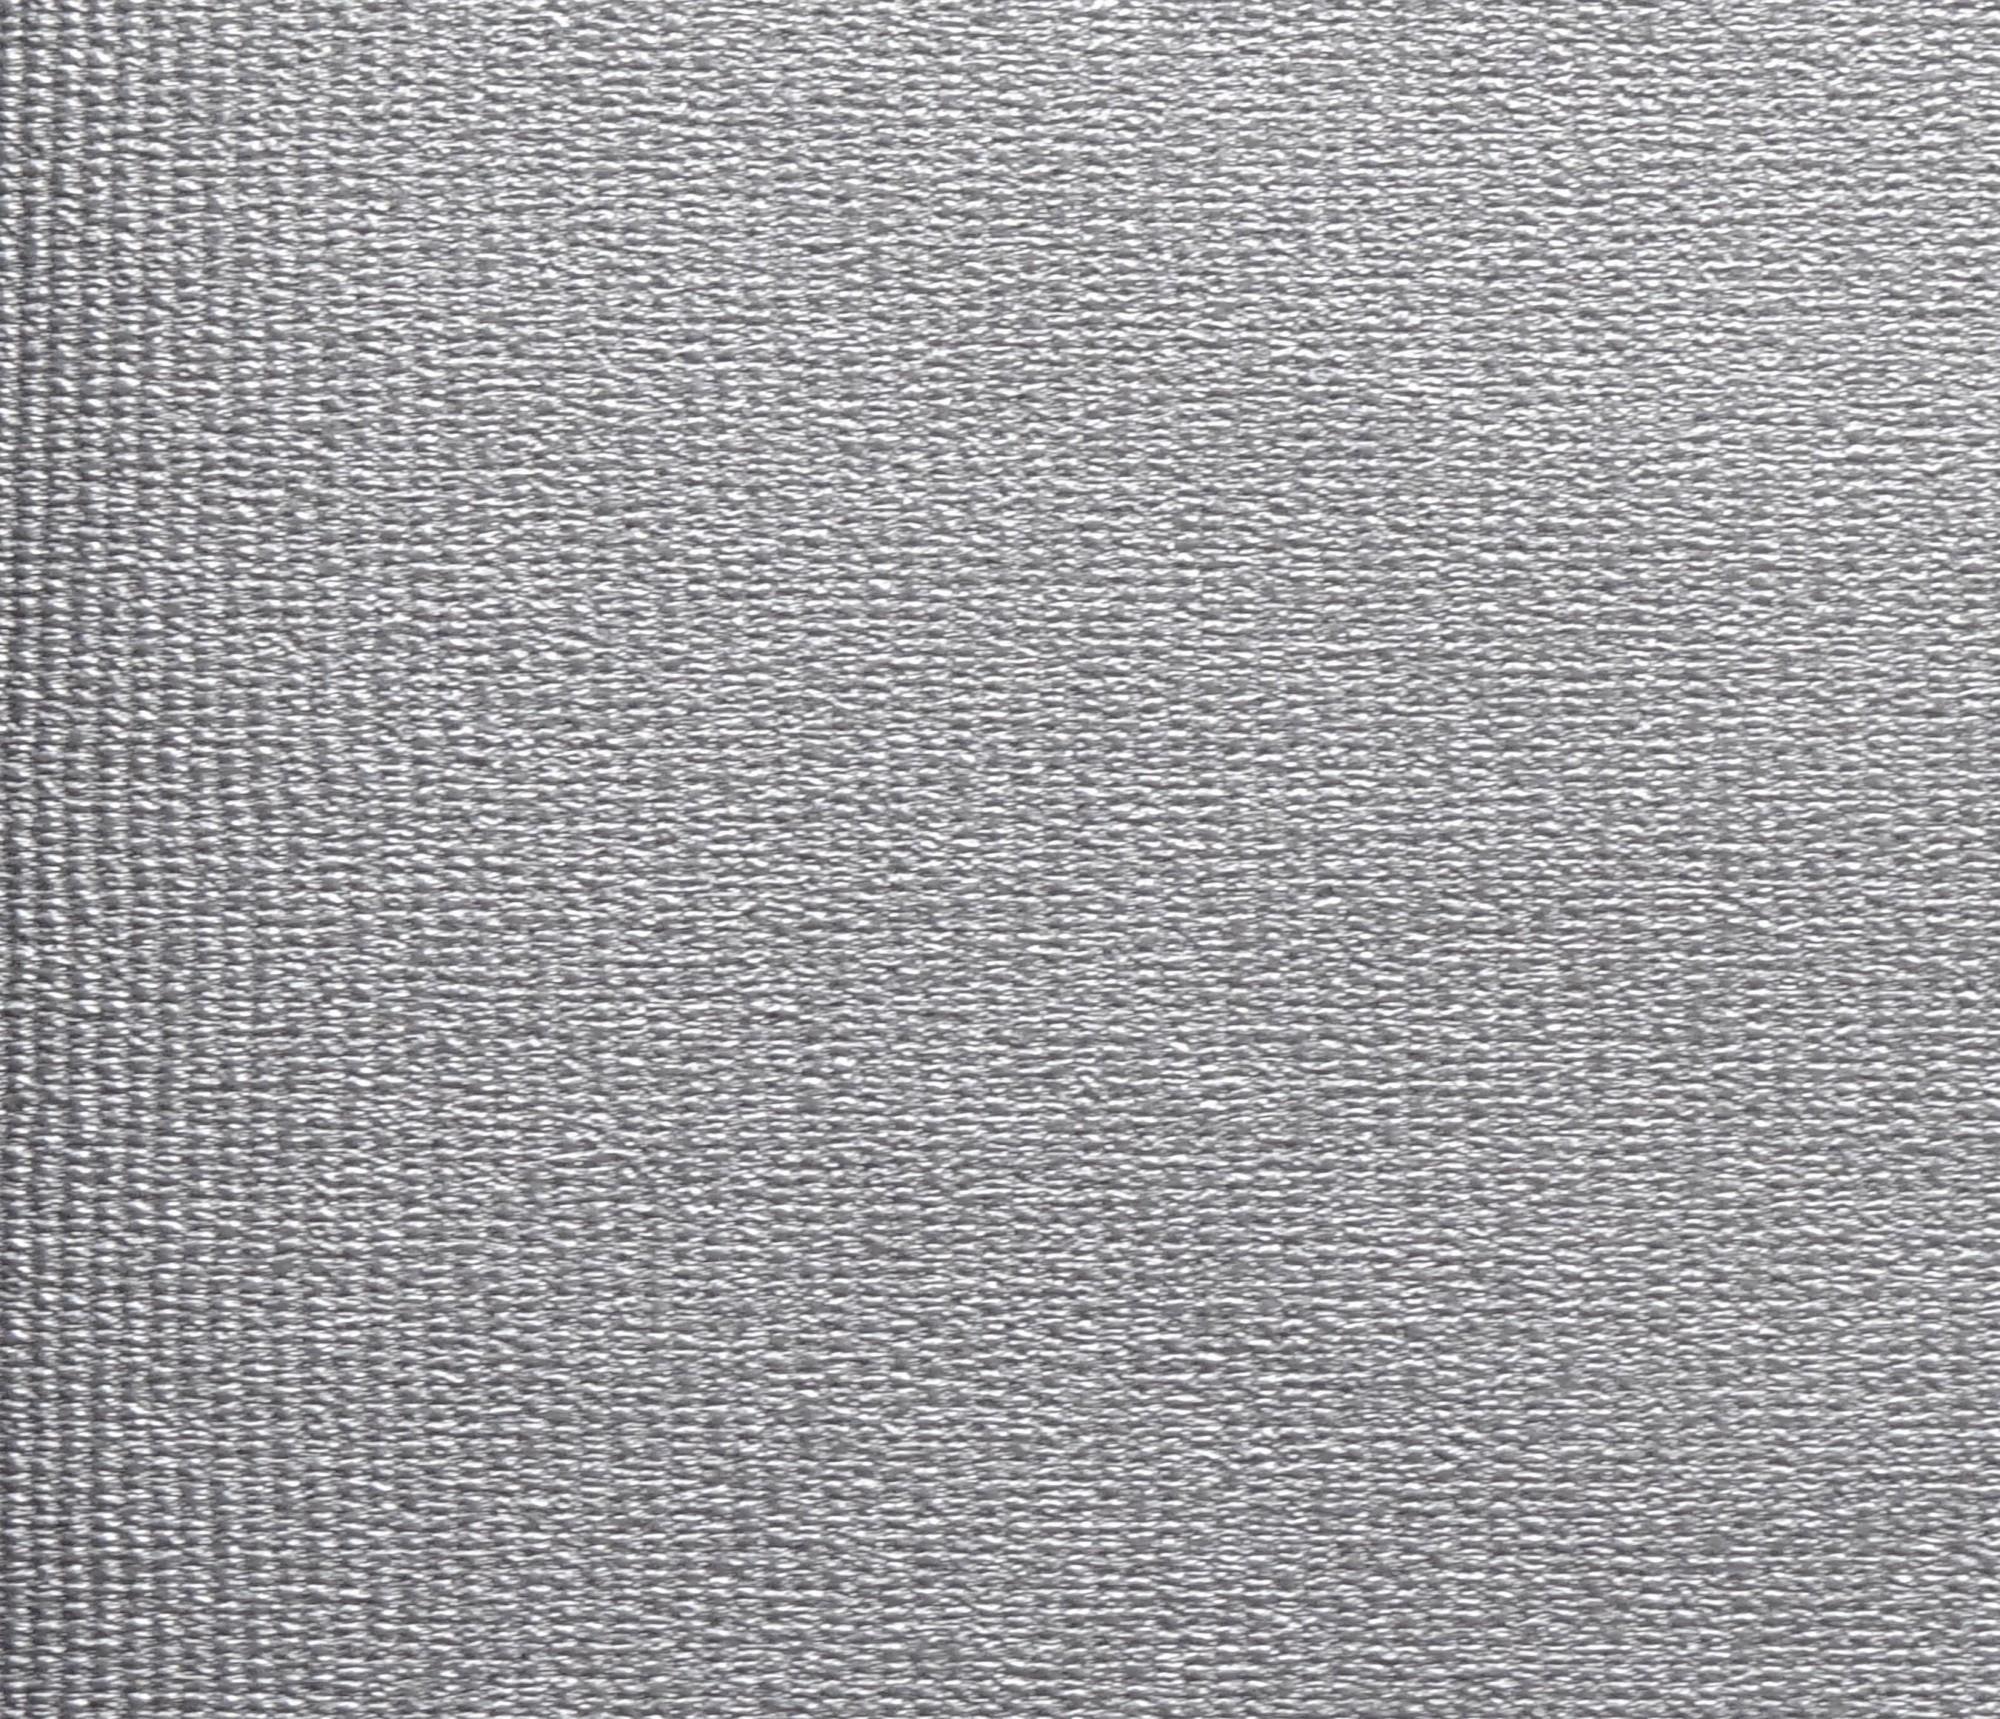 marburg designtapete karim rashid tapete 51947 uni silber metallic. Black Bedroom Furniture Sets. Home Design Ideas